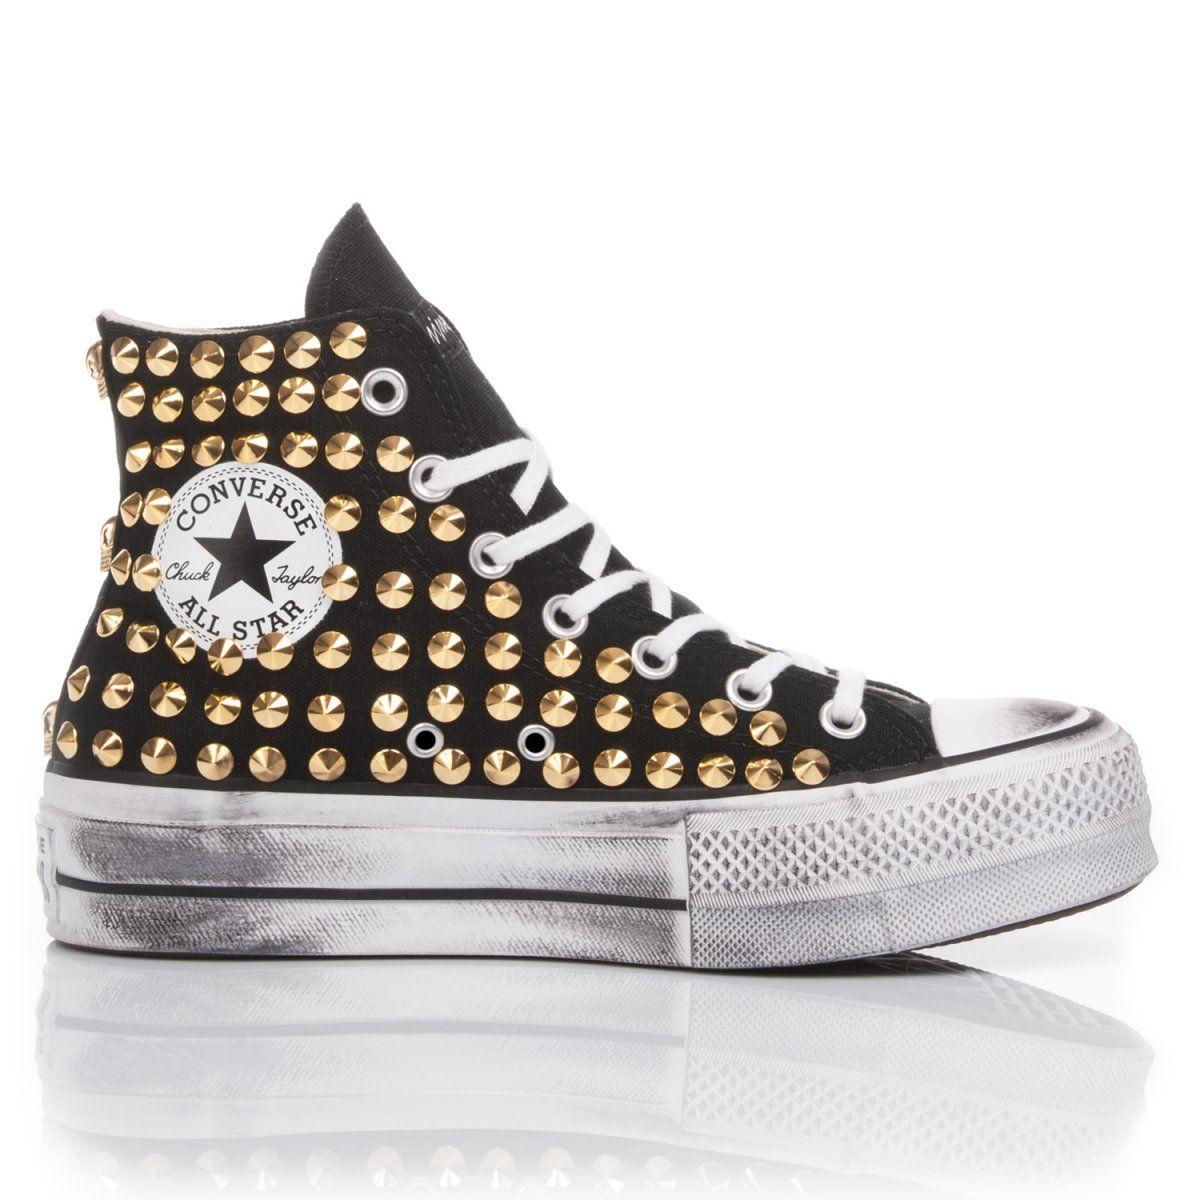 Converse Platform Nera Borchie Oro en 2020 | Chaussure